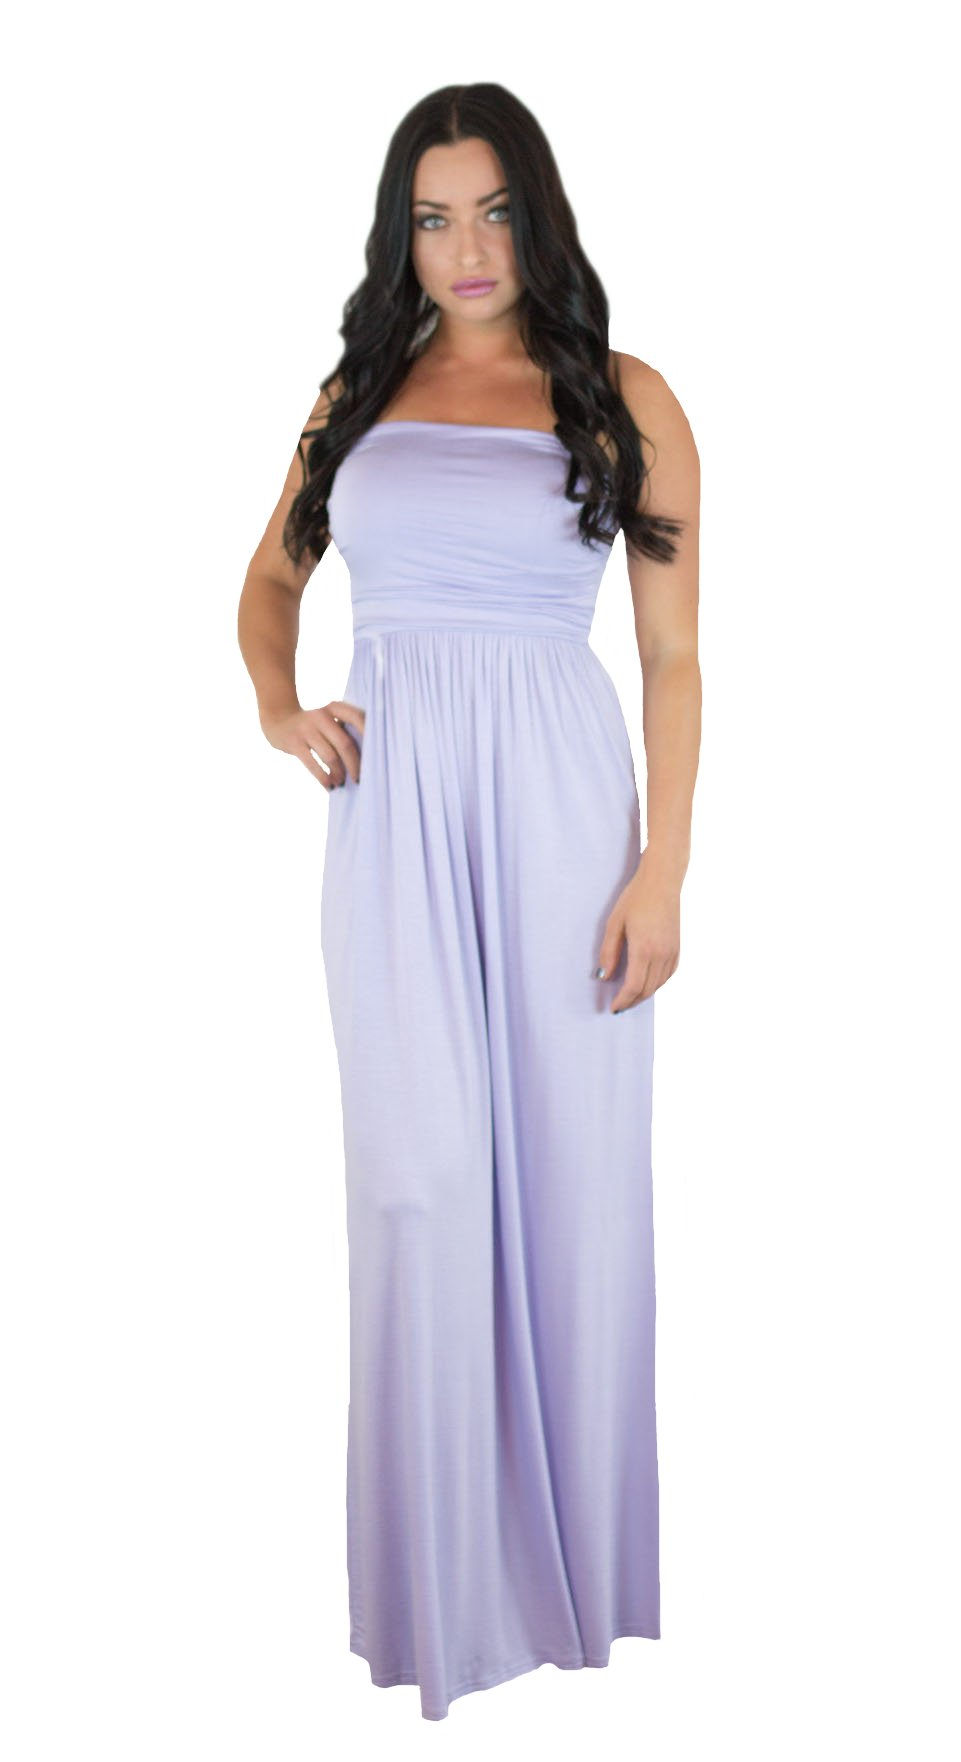 Available at Amazon: Charm Your Prince Women's Sleeveless Maxi Dress